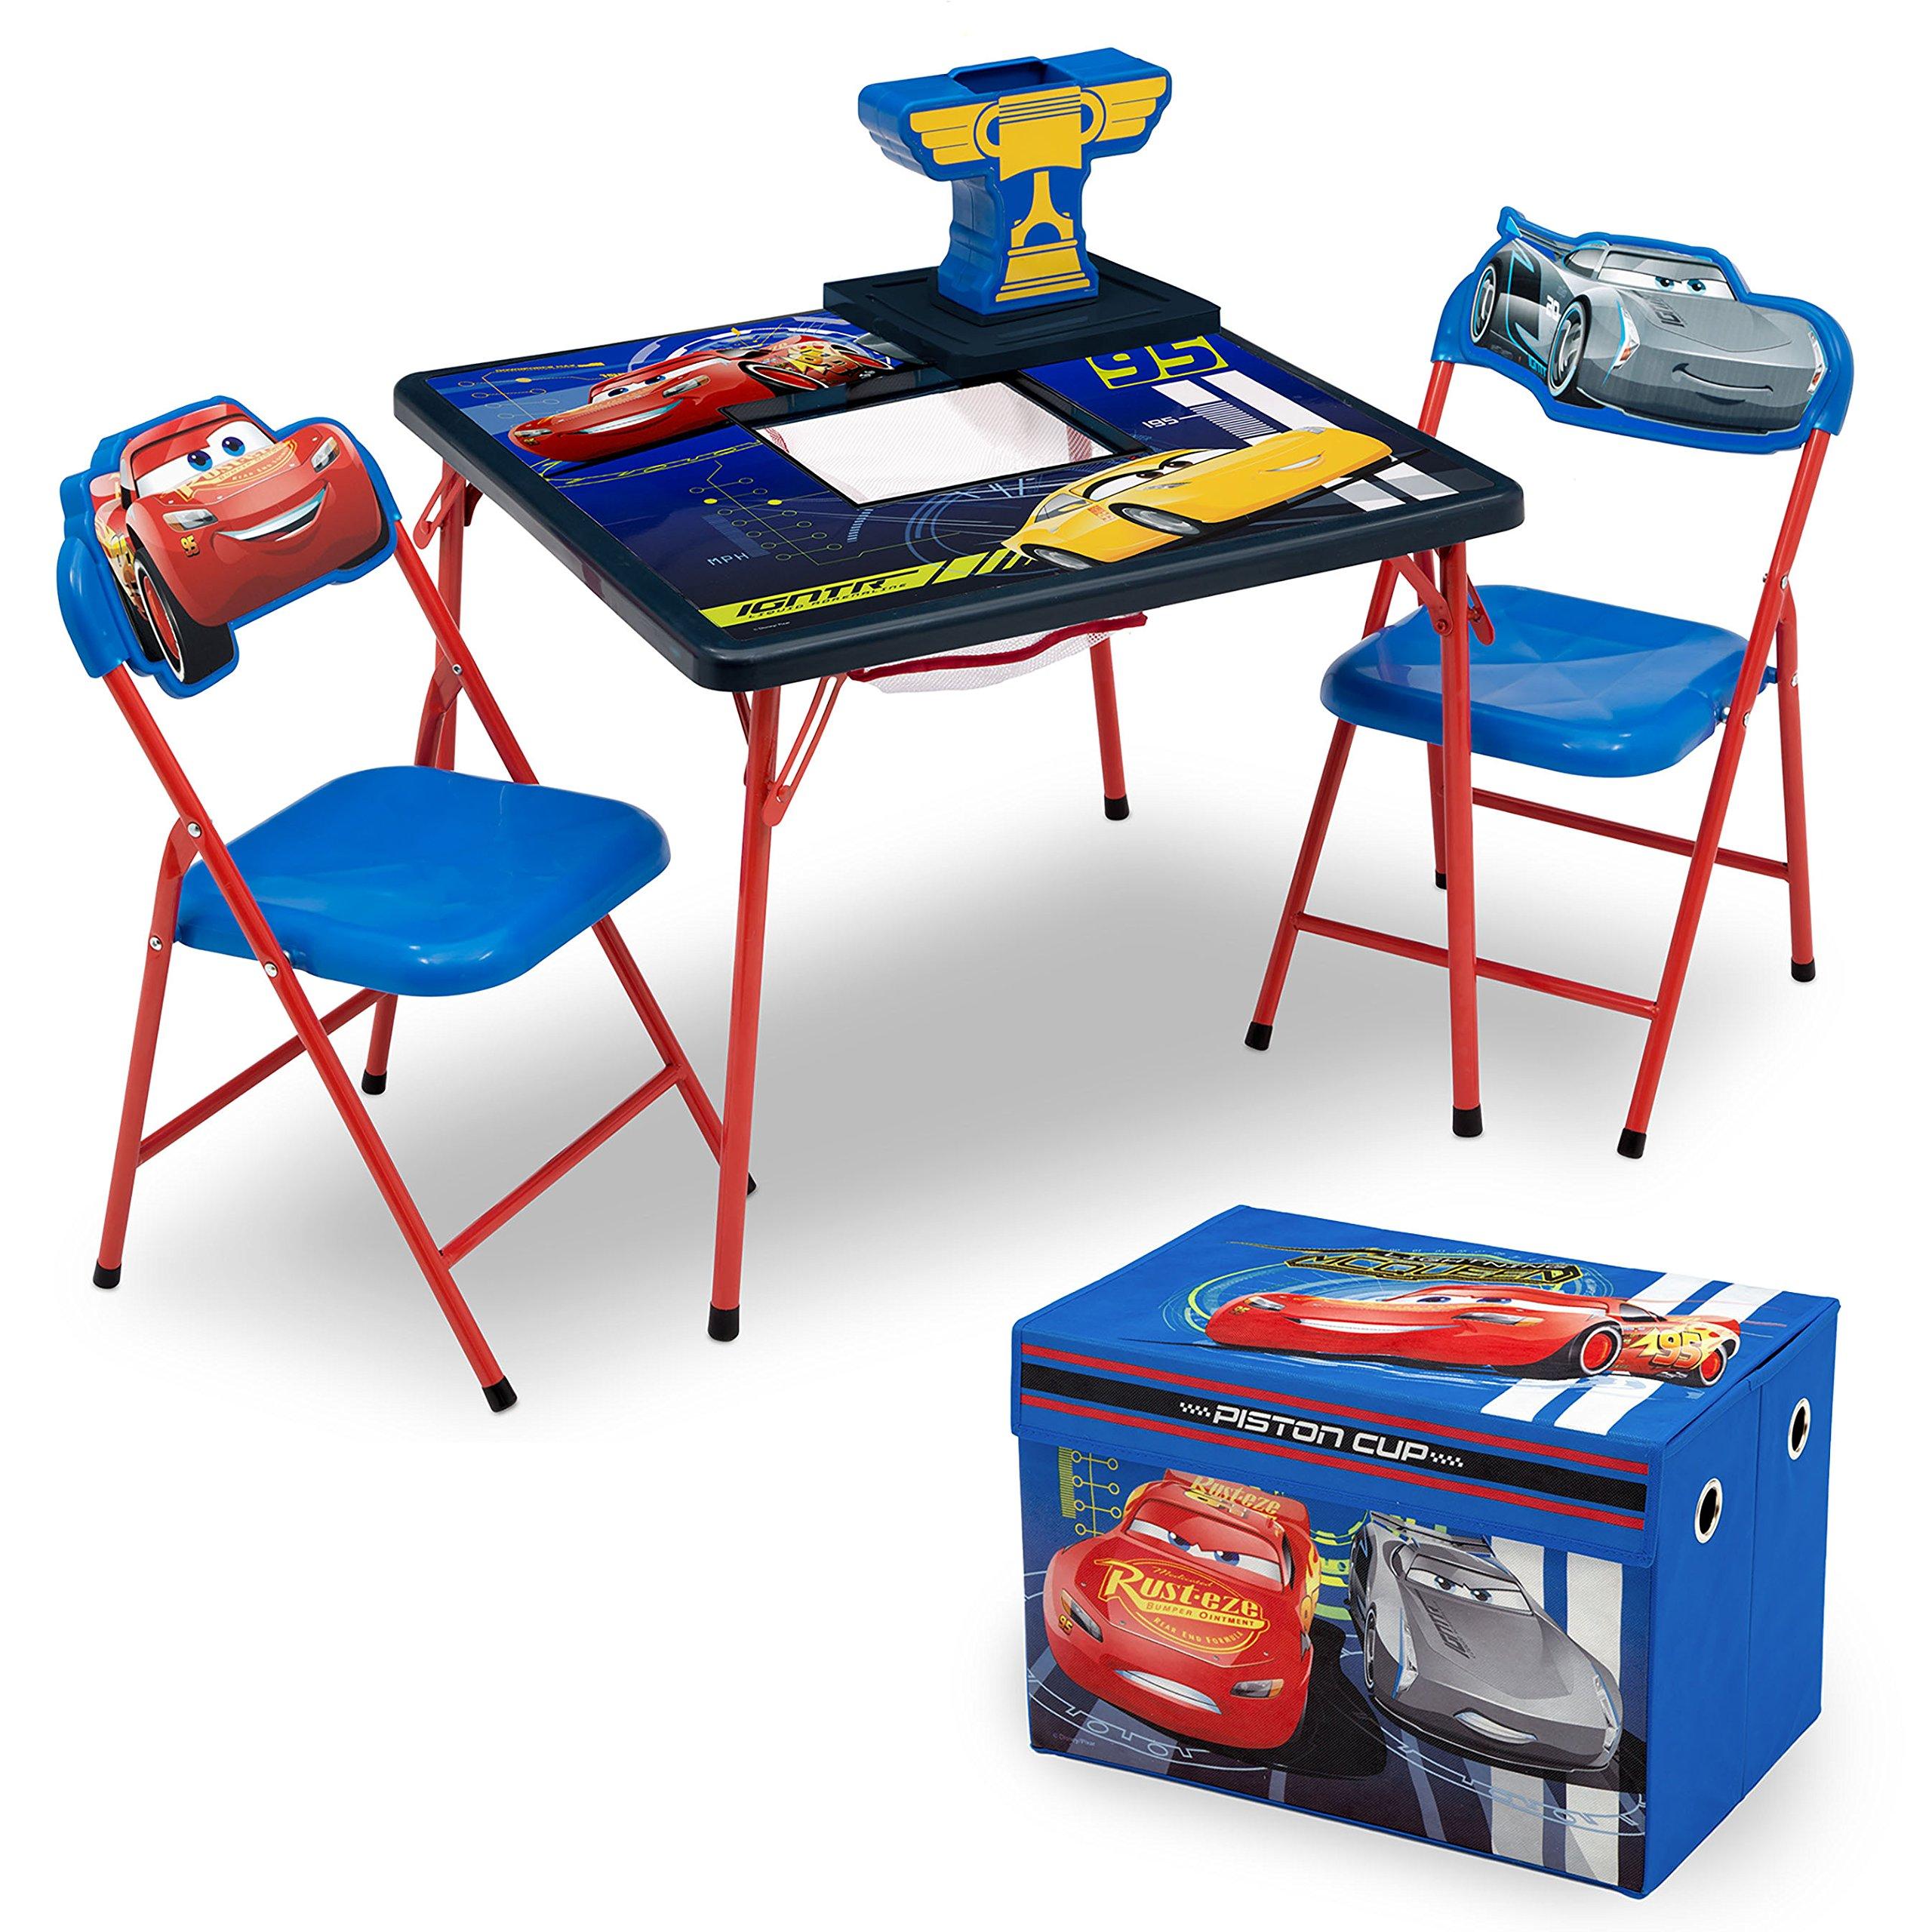 cars bedroom furniture amazon com rh amazon com Crayola Bedroom Furniture Teen Car Bedroom